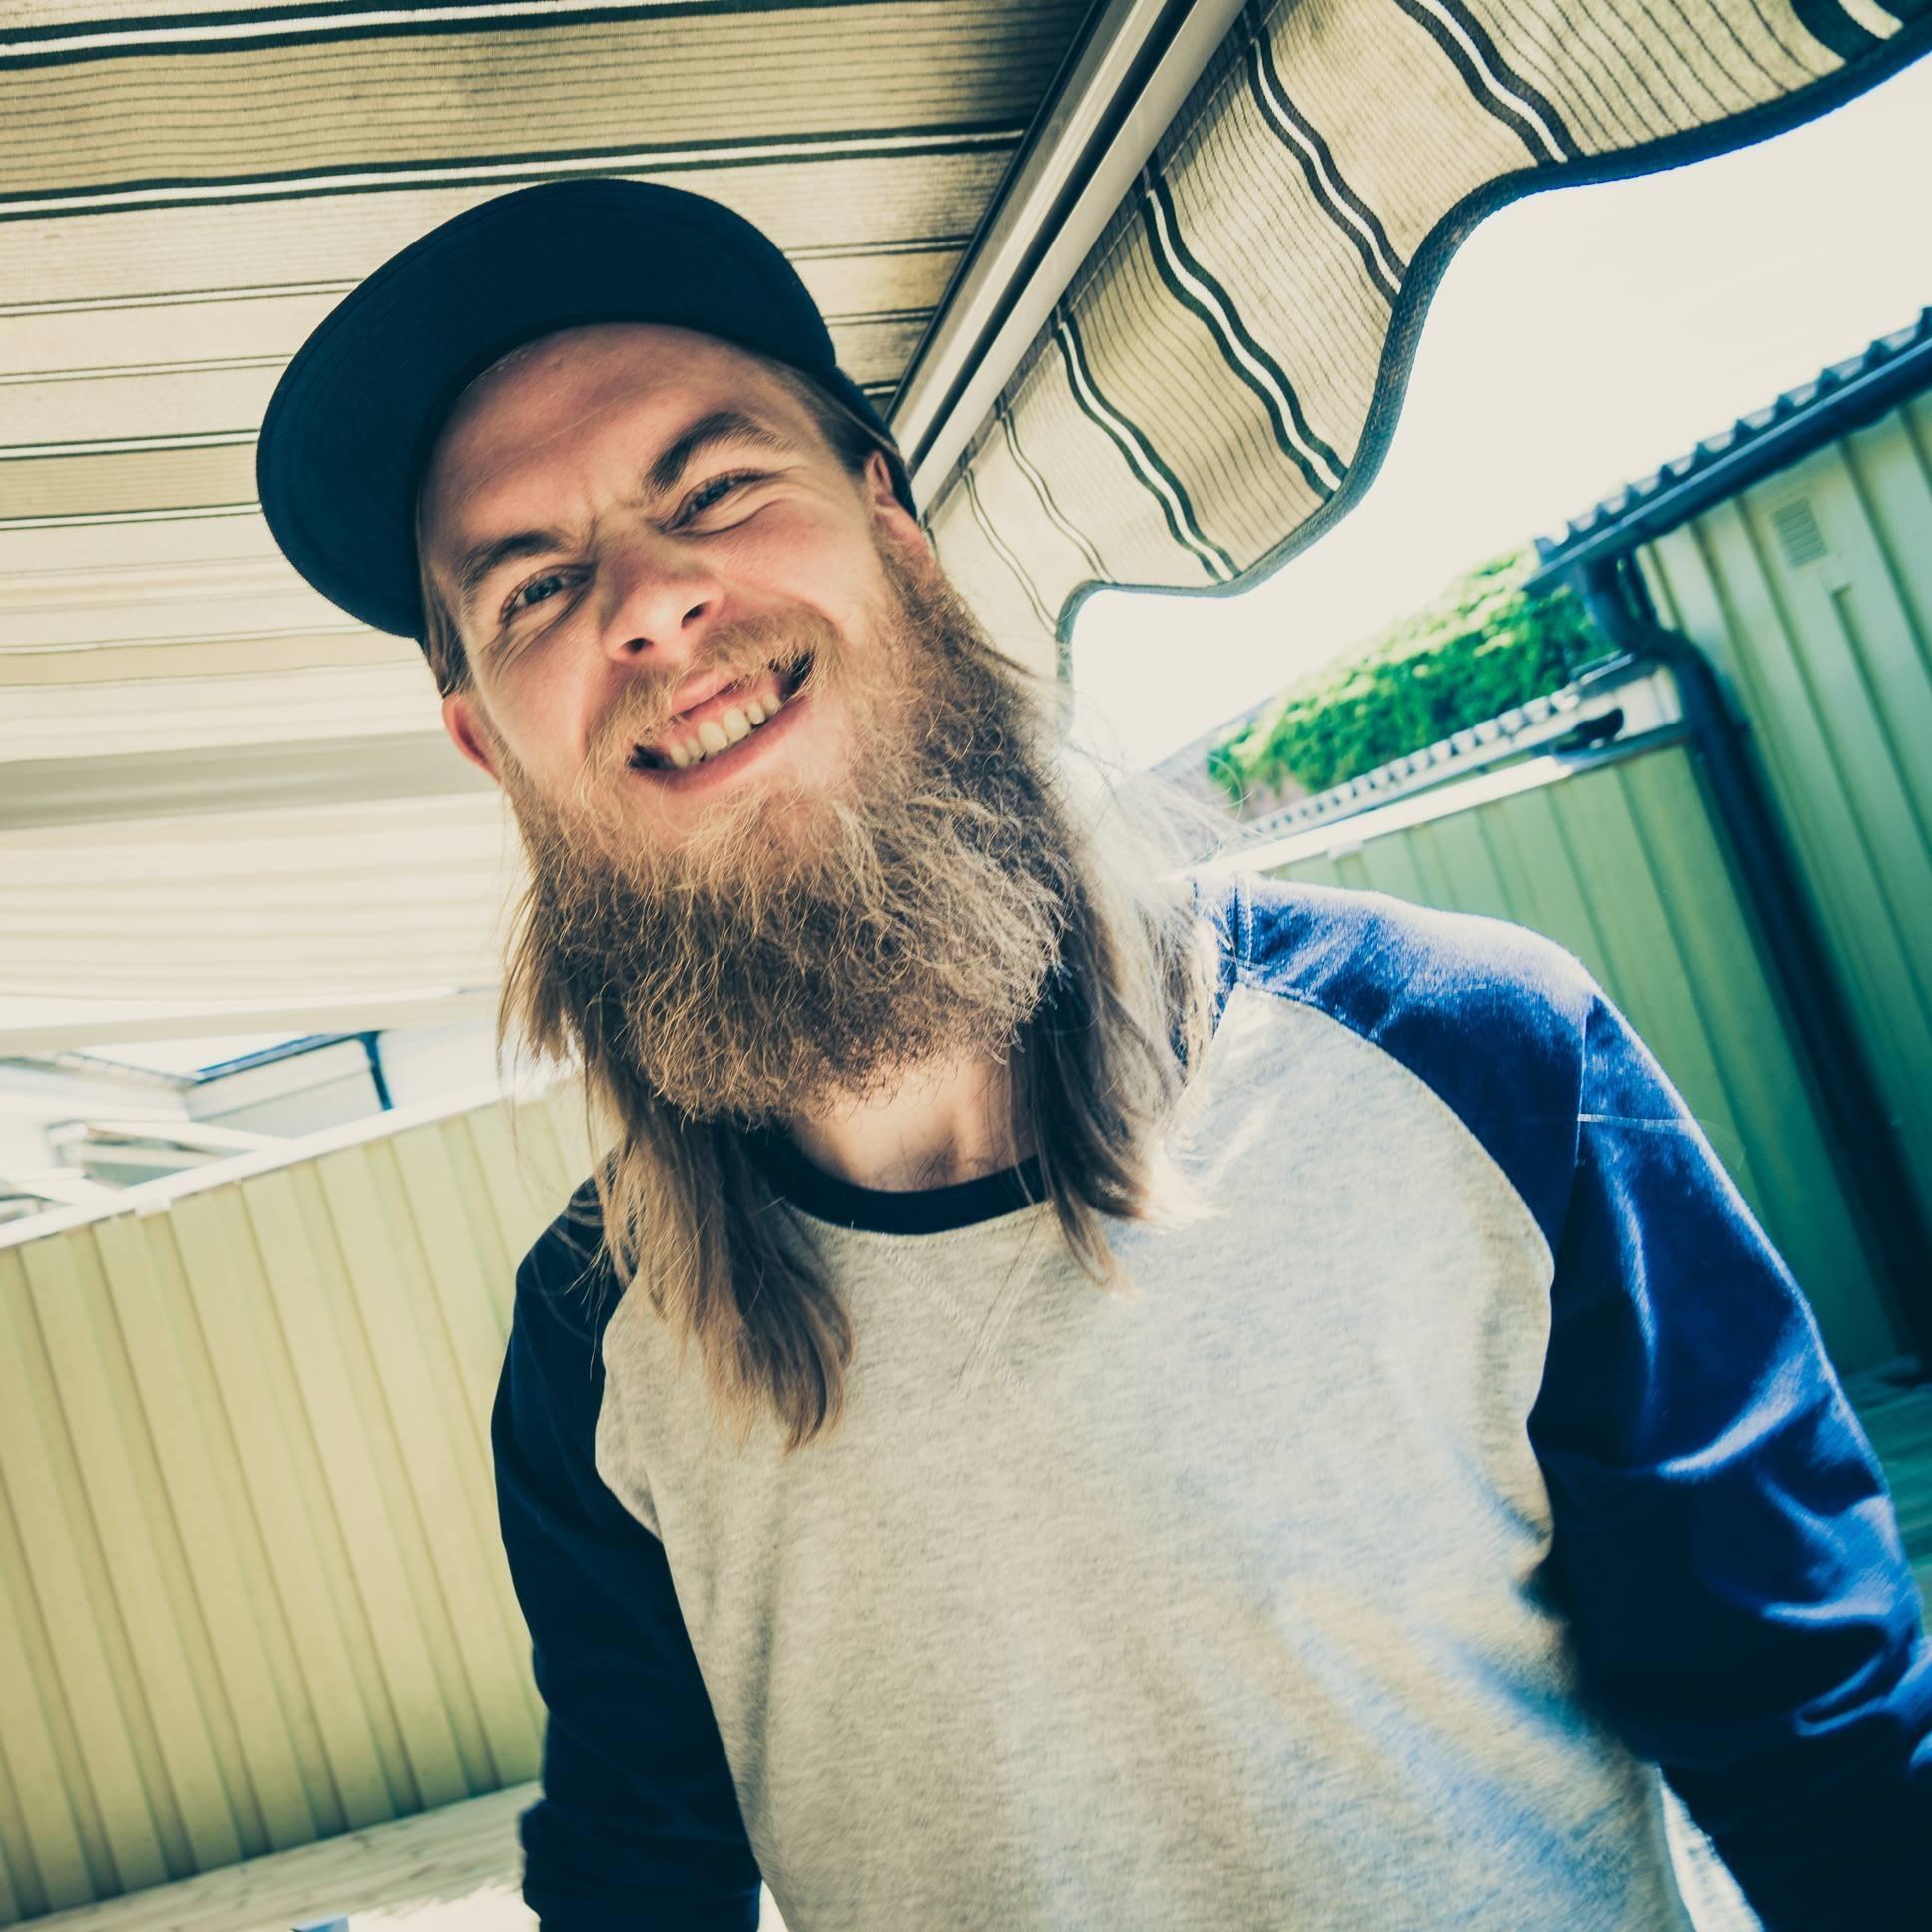 Go to Kalle Stillersson's profile